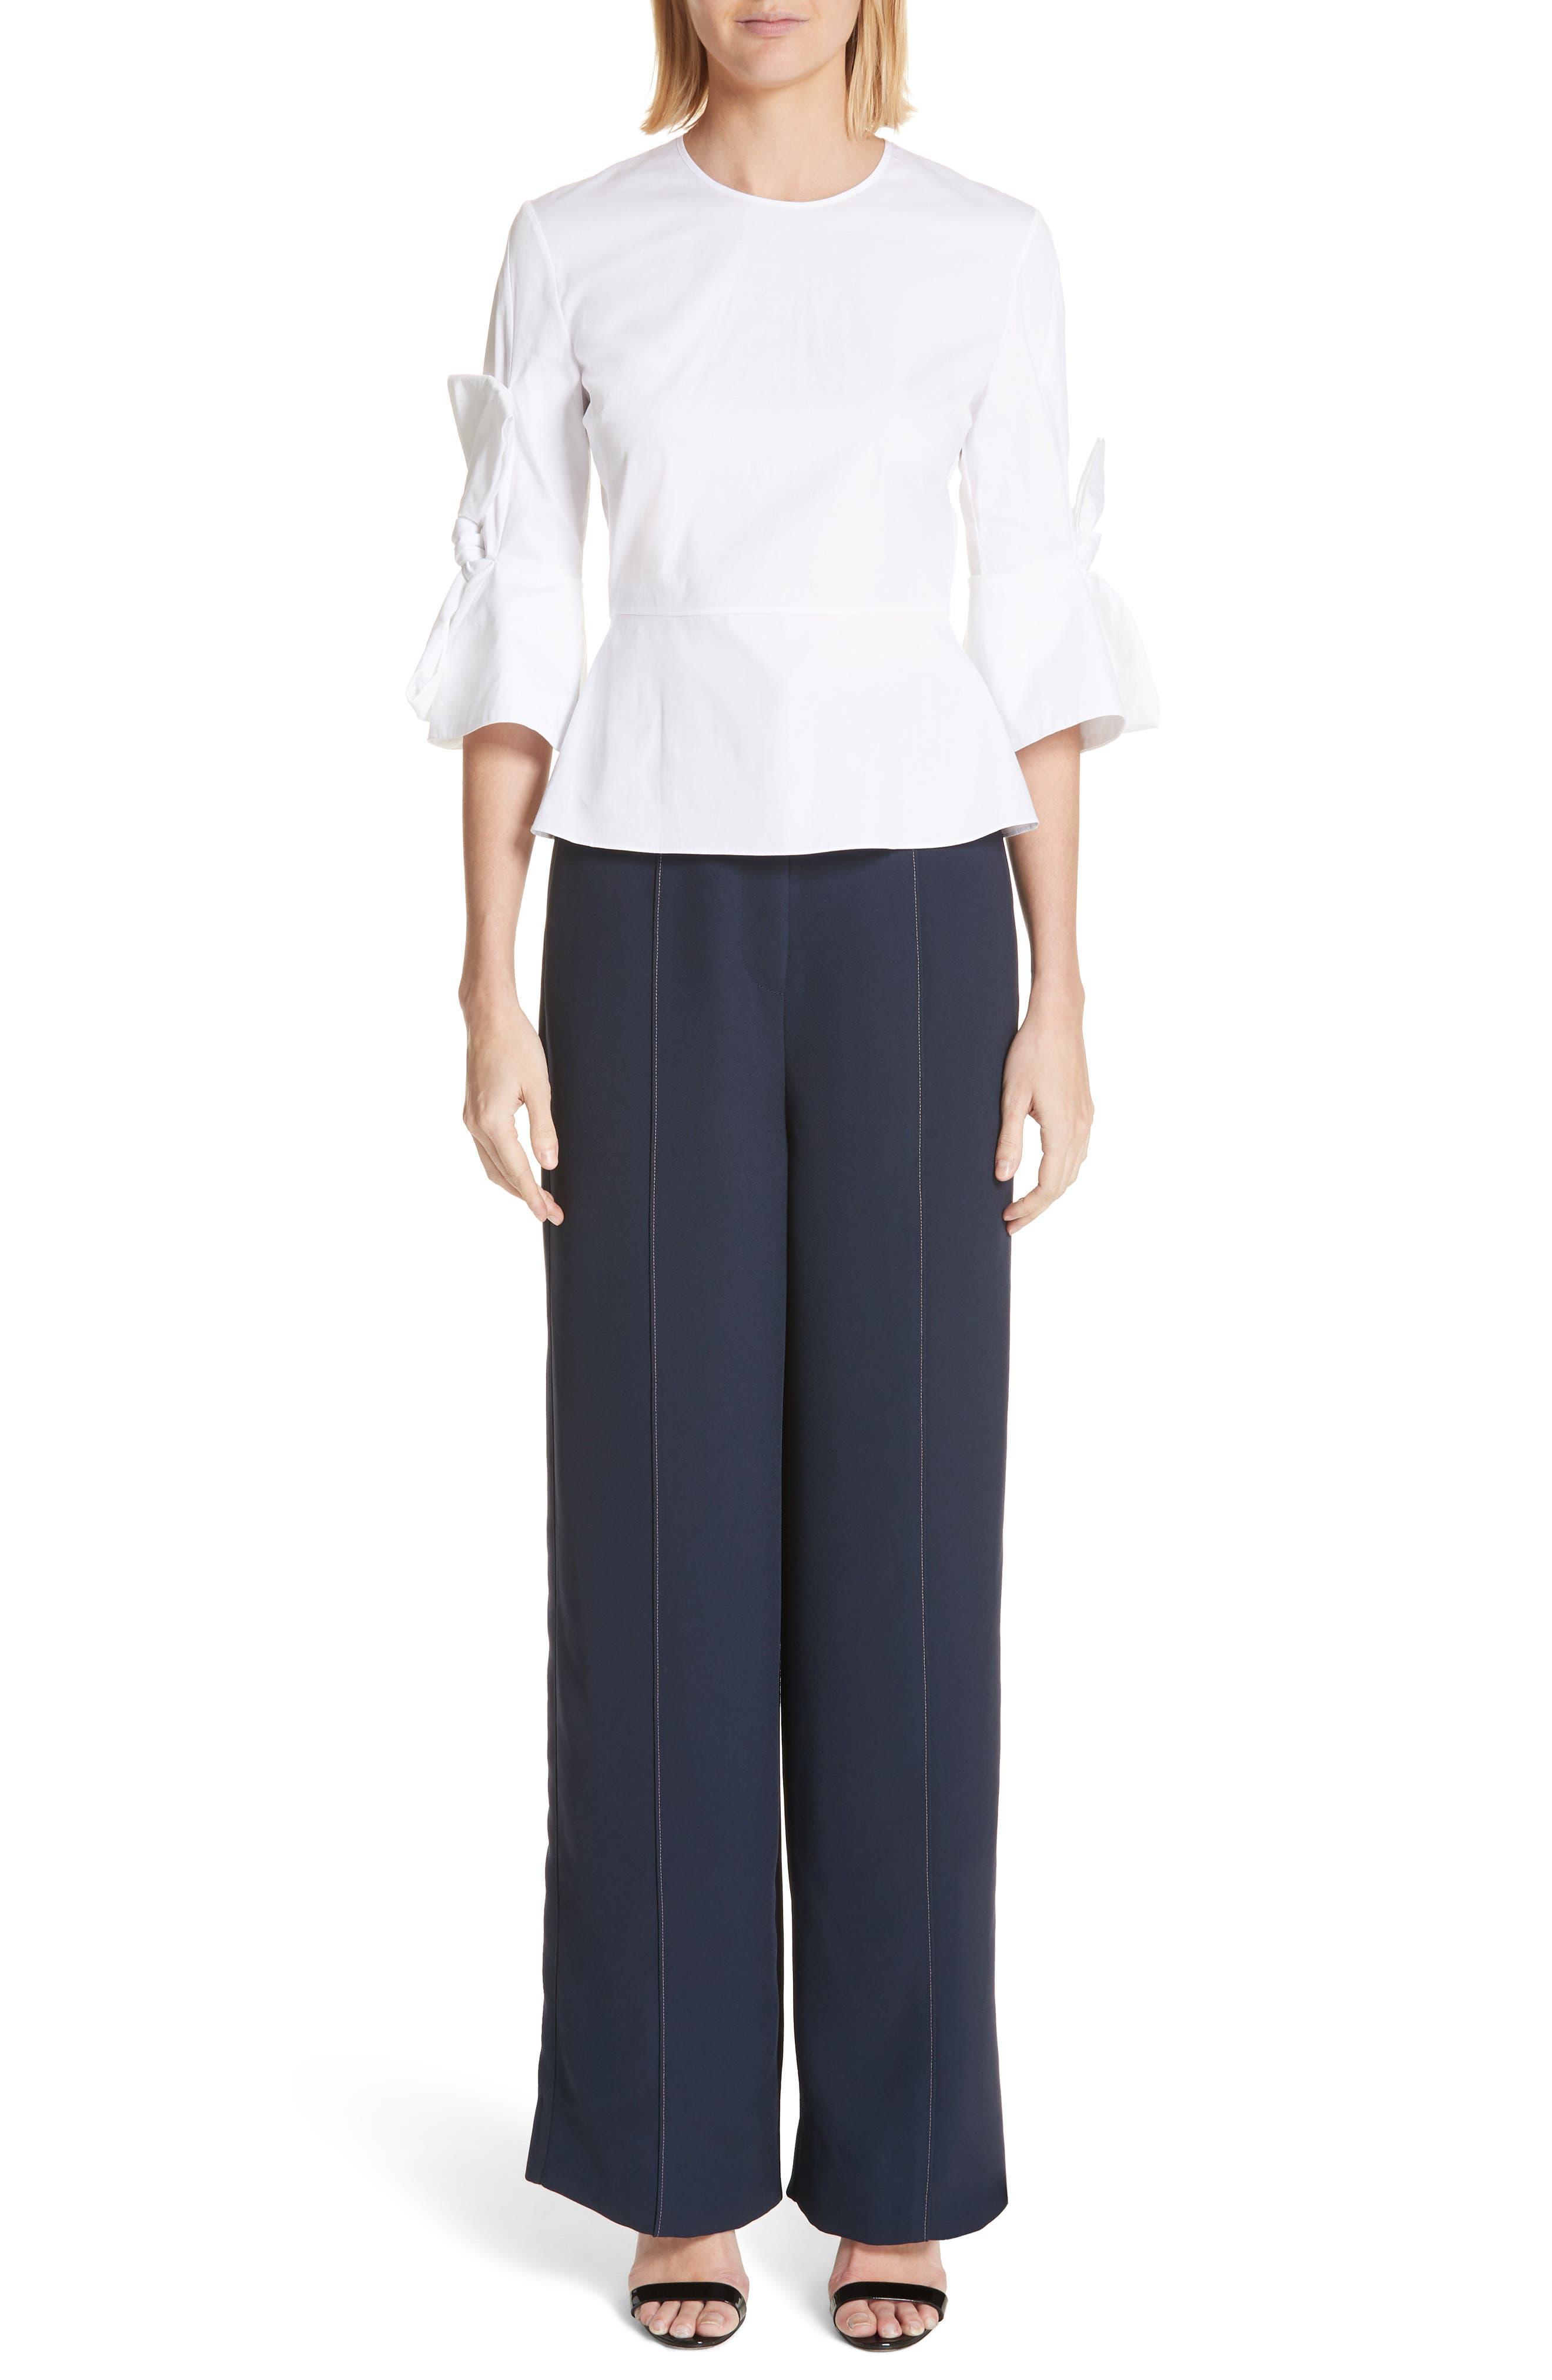 Lapari Pintuck Trousers,                             Alternate thumbnail 7, color,                             Navy